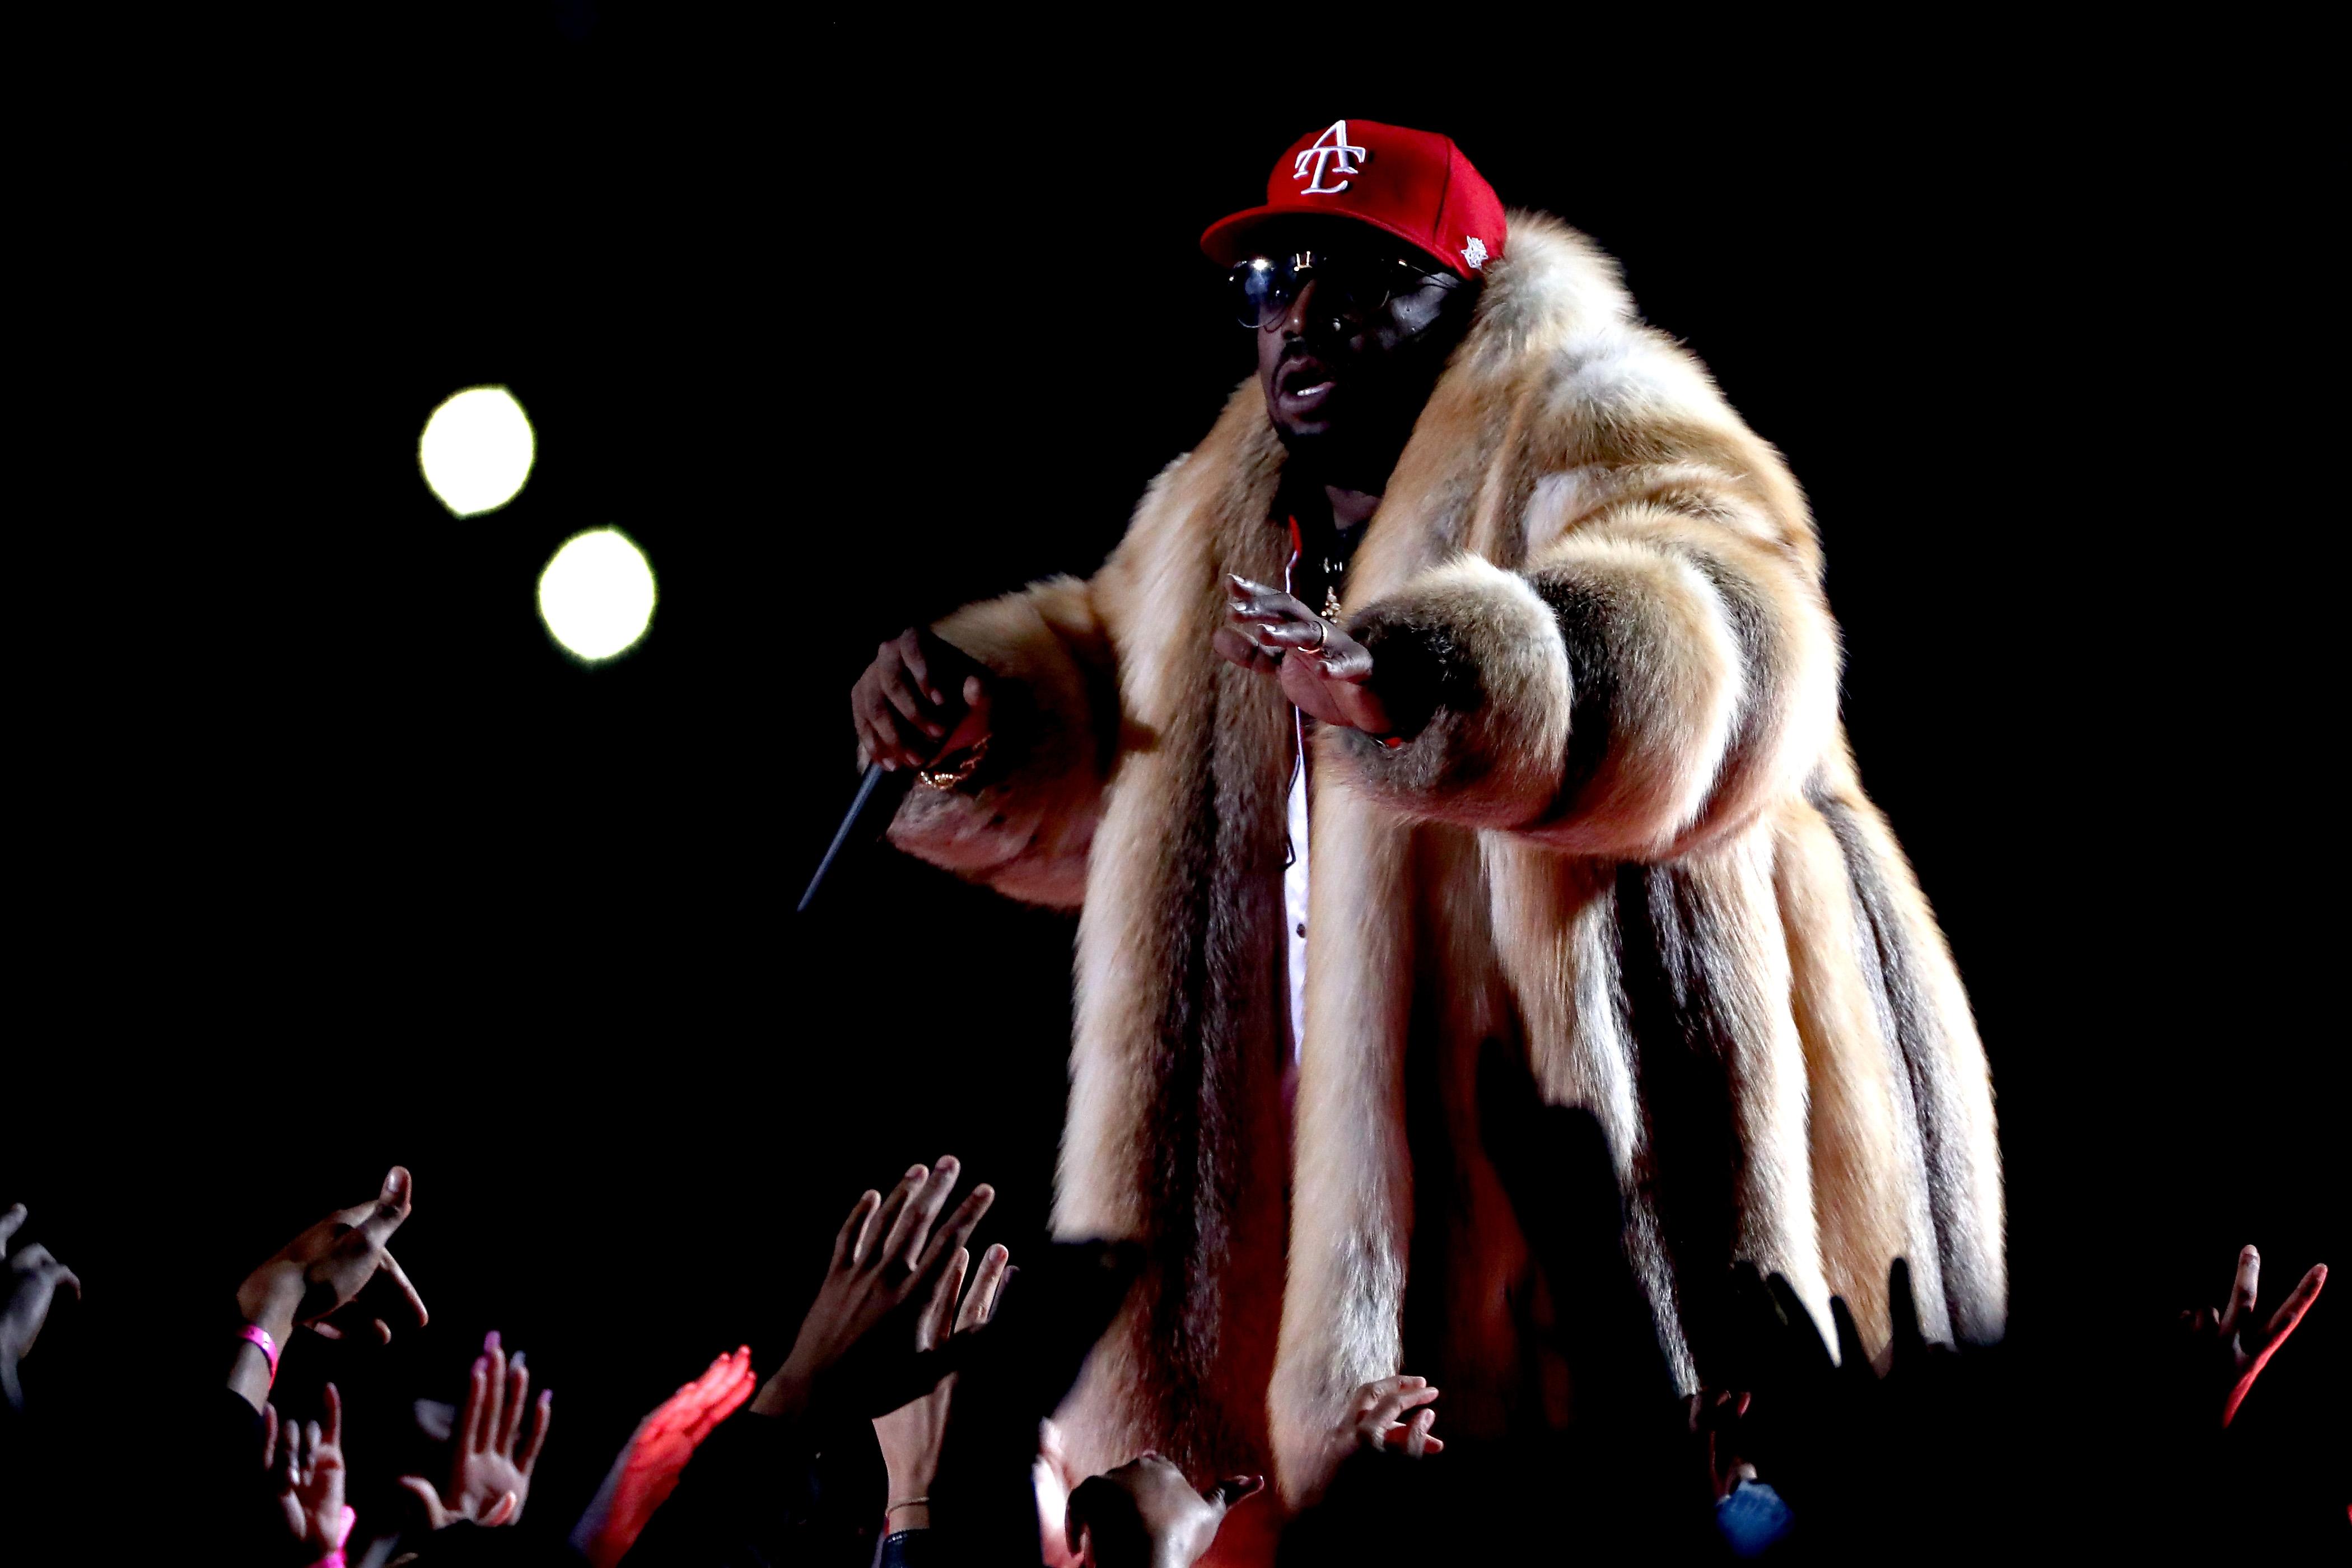 PETA Blasts Big Boi For Rocking A Giant Fur Coat During Super Bowl Halftime Performance